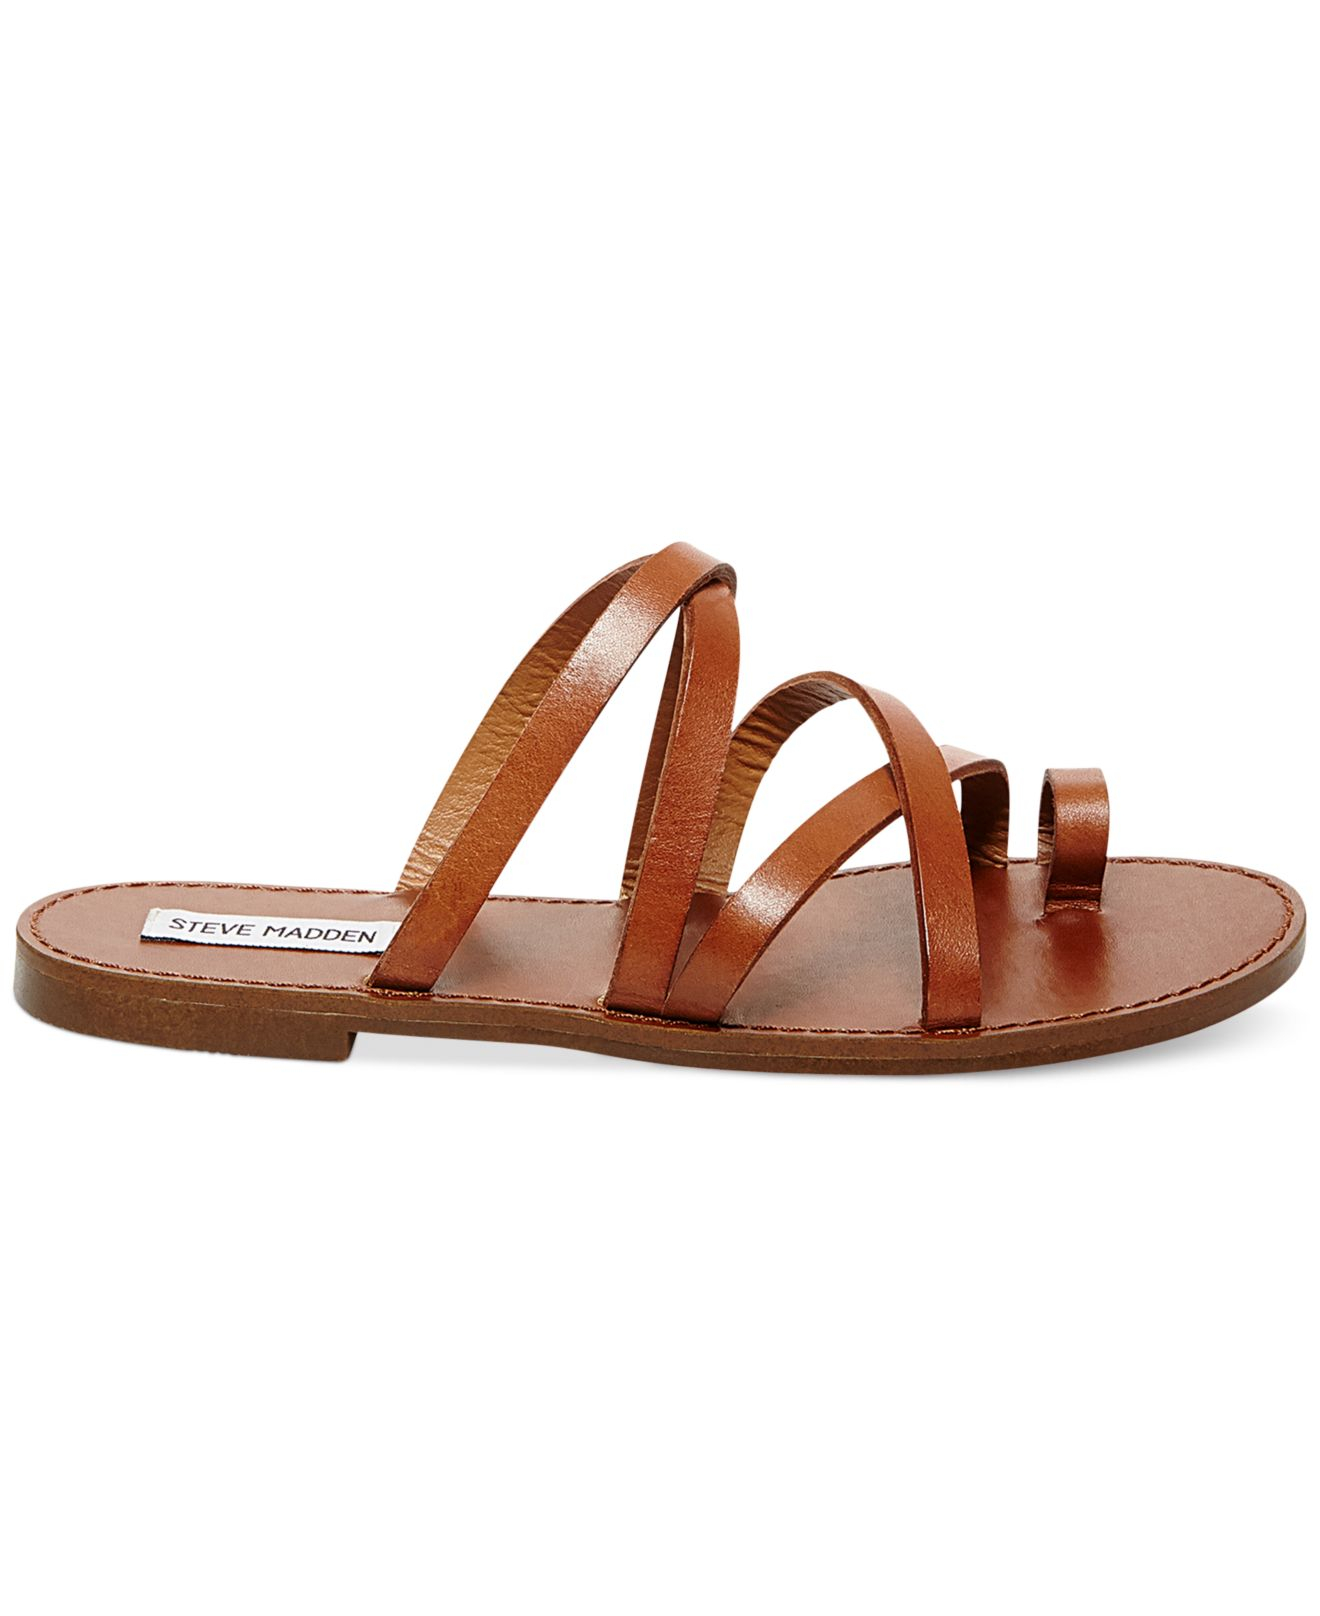 a1eaf65d3a2 Steve Madden Toe Ring Sandals